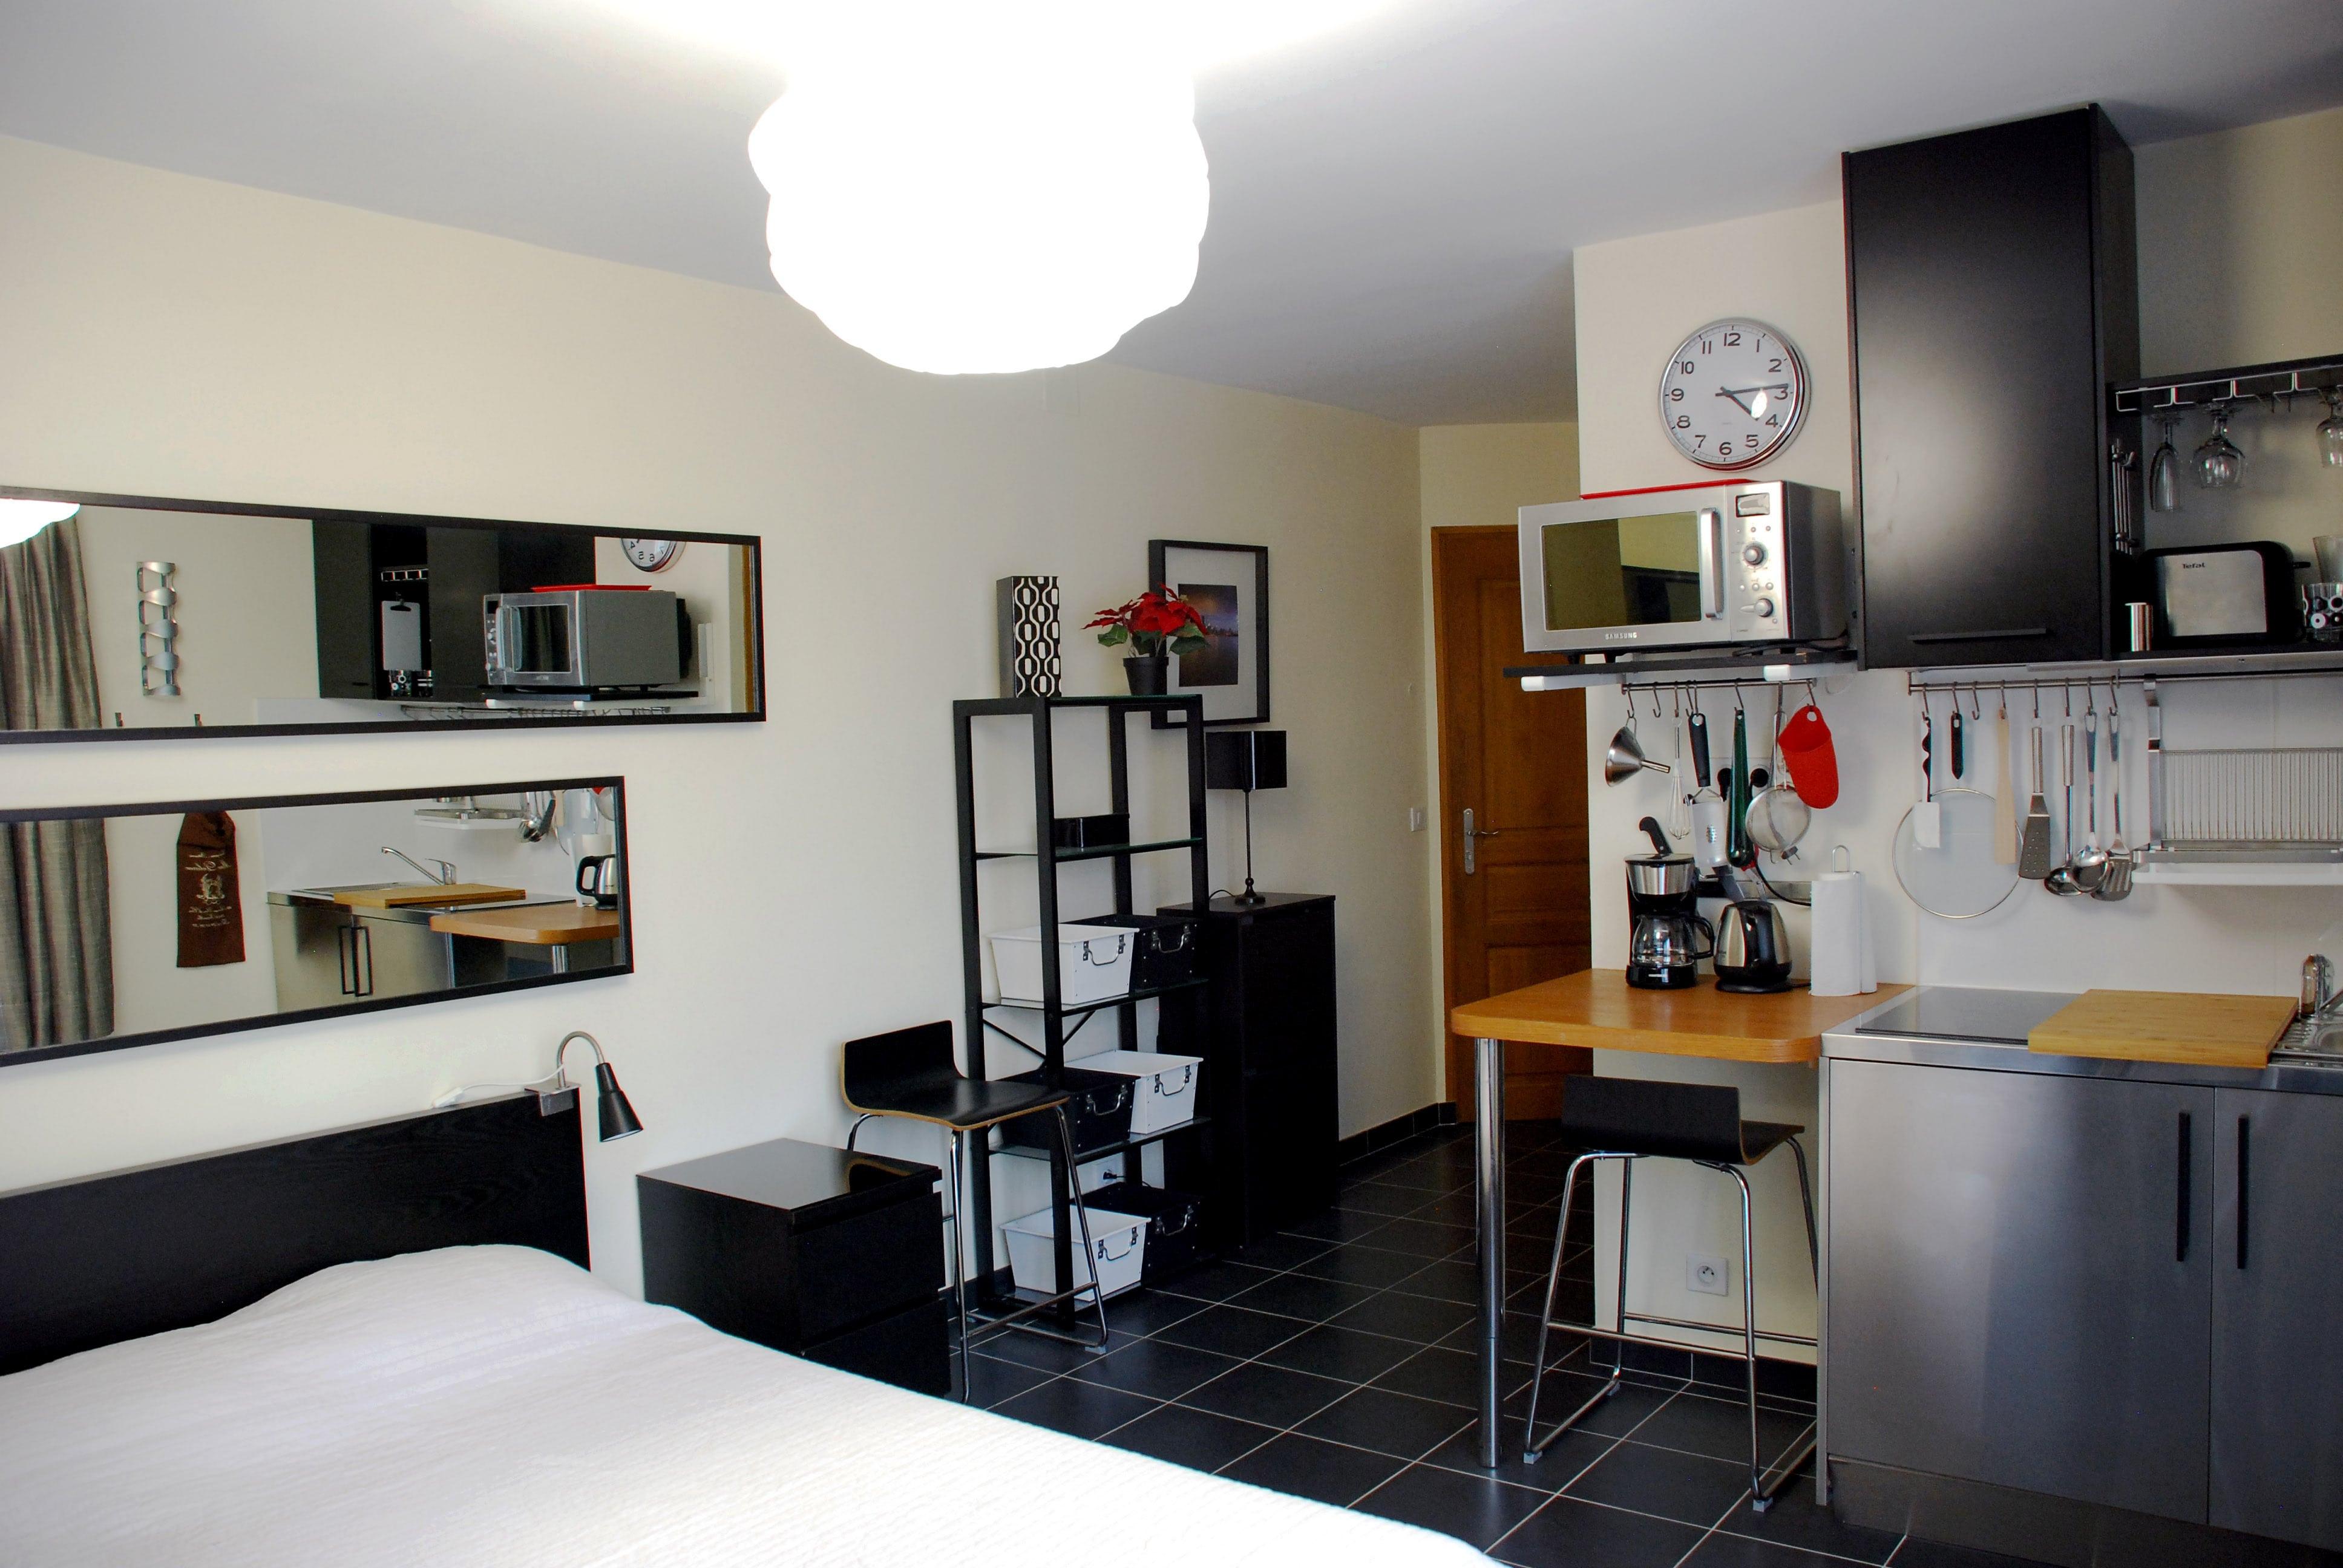 appartement studio meublé versailles genet salle de bain